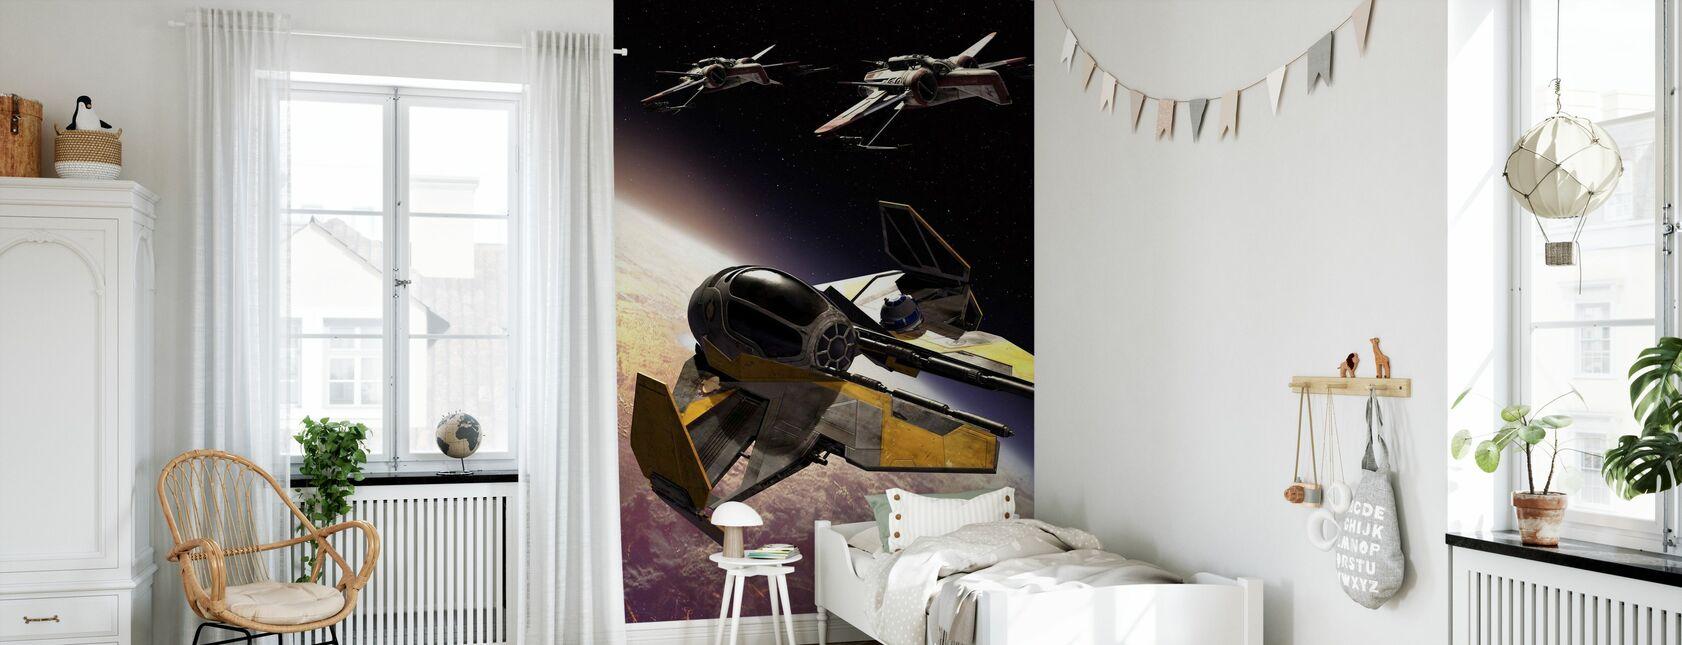 Star Wars - ARC-170 klon Starfighters - Tapet - Børneværelse